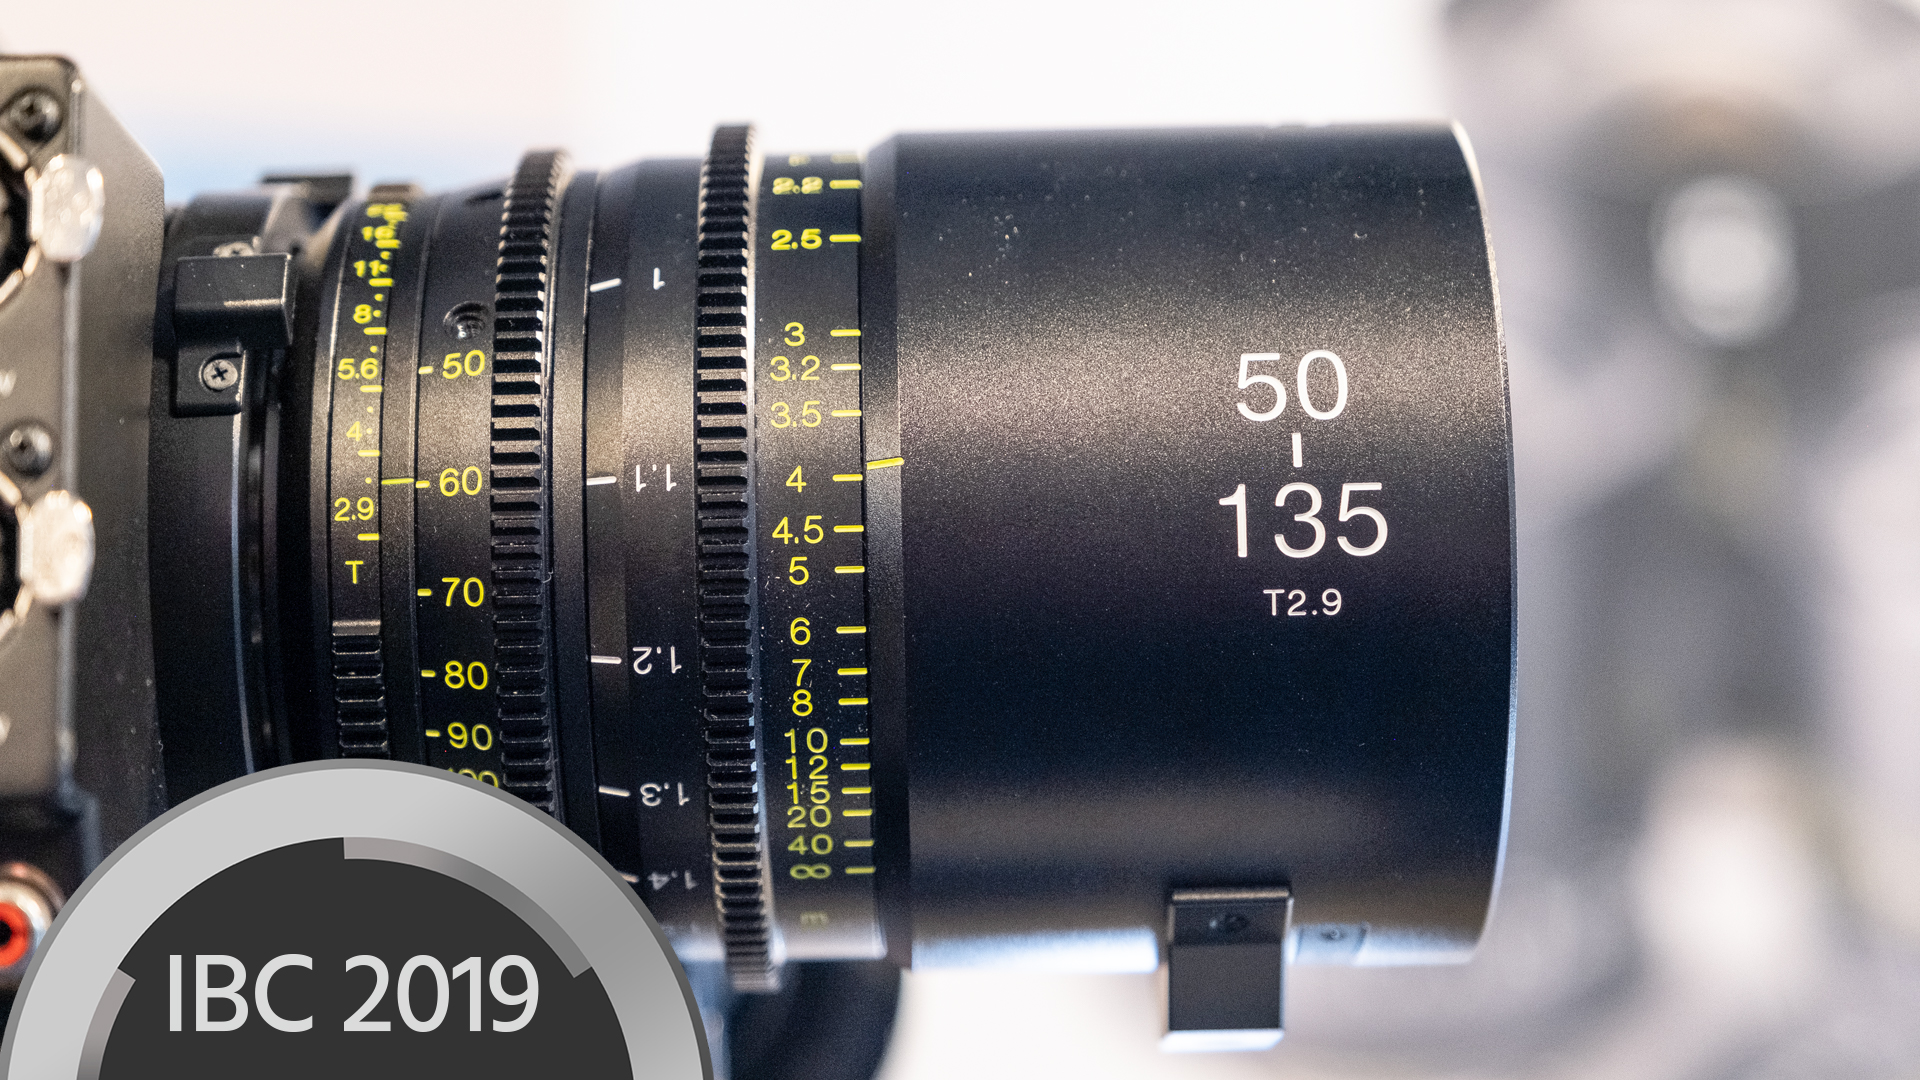 Anuncian lente zoom de cine Tokina 50-135 mm T2.9 Mark II